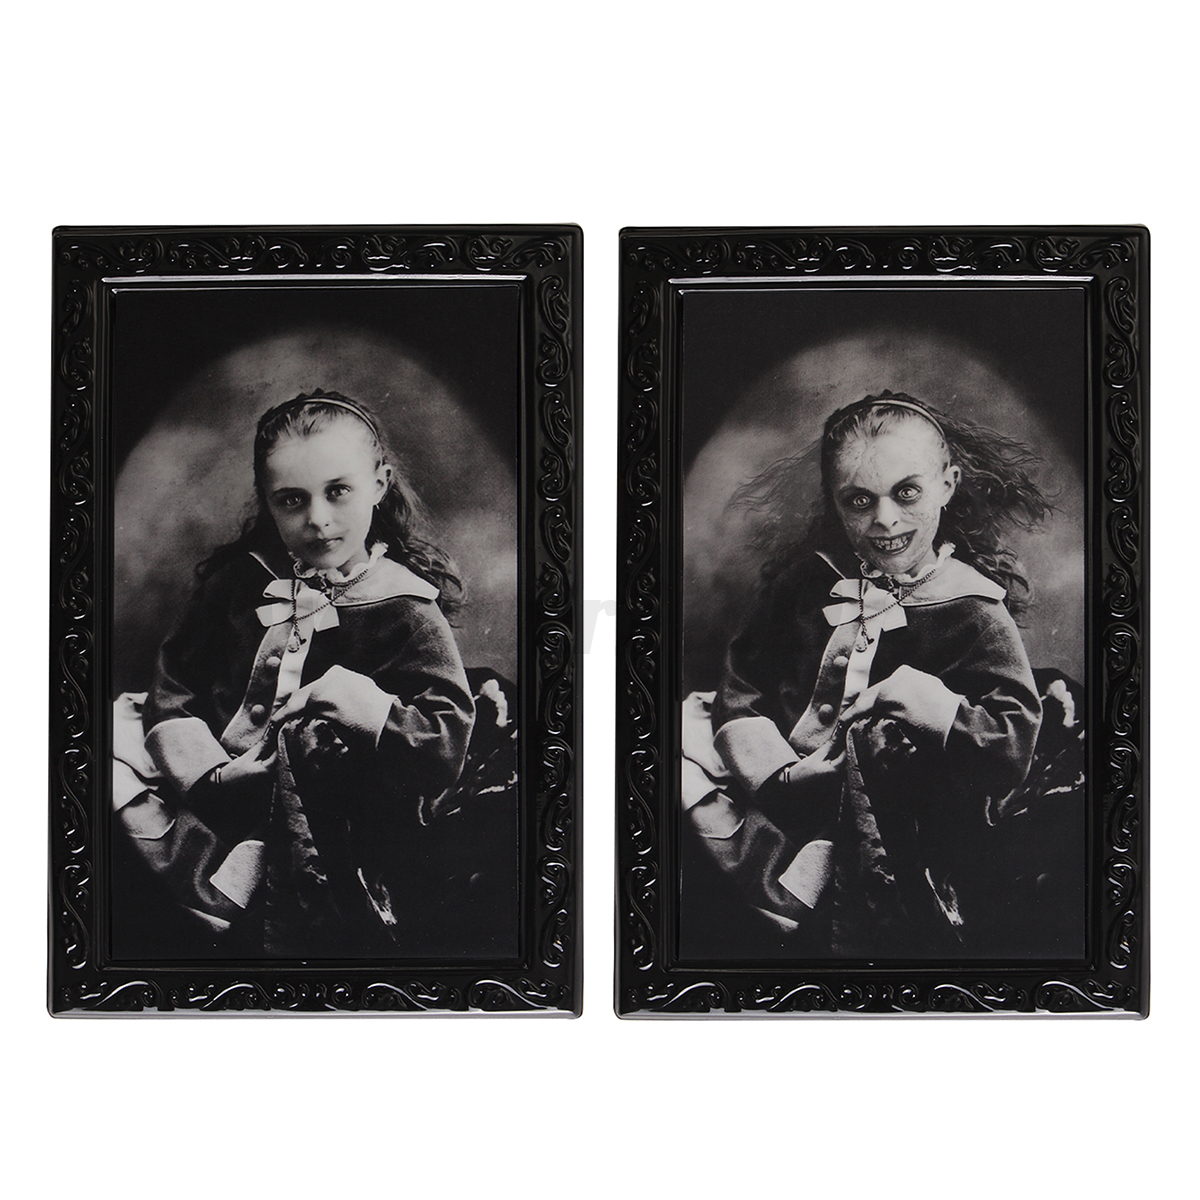 Horror-Halloween-Lenticular-3D-Changing-Haunted-Photo-Frame-Portrait-Wall-Decor